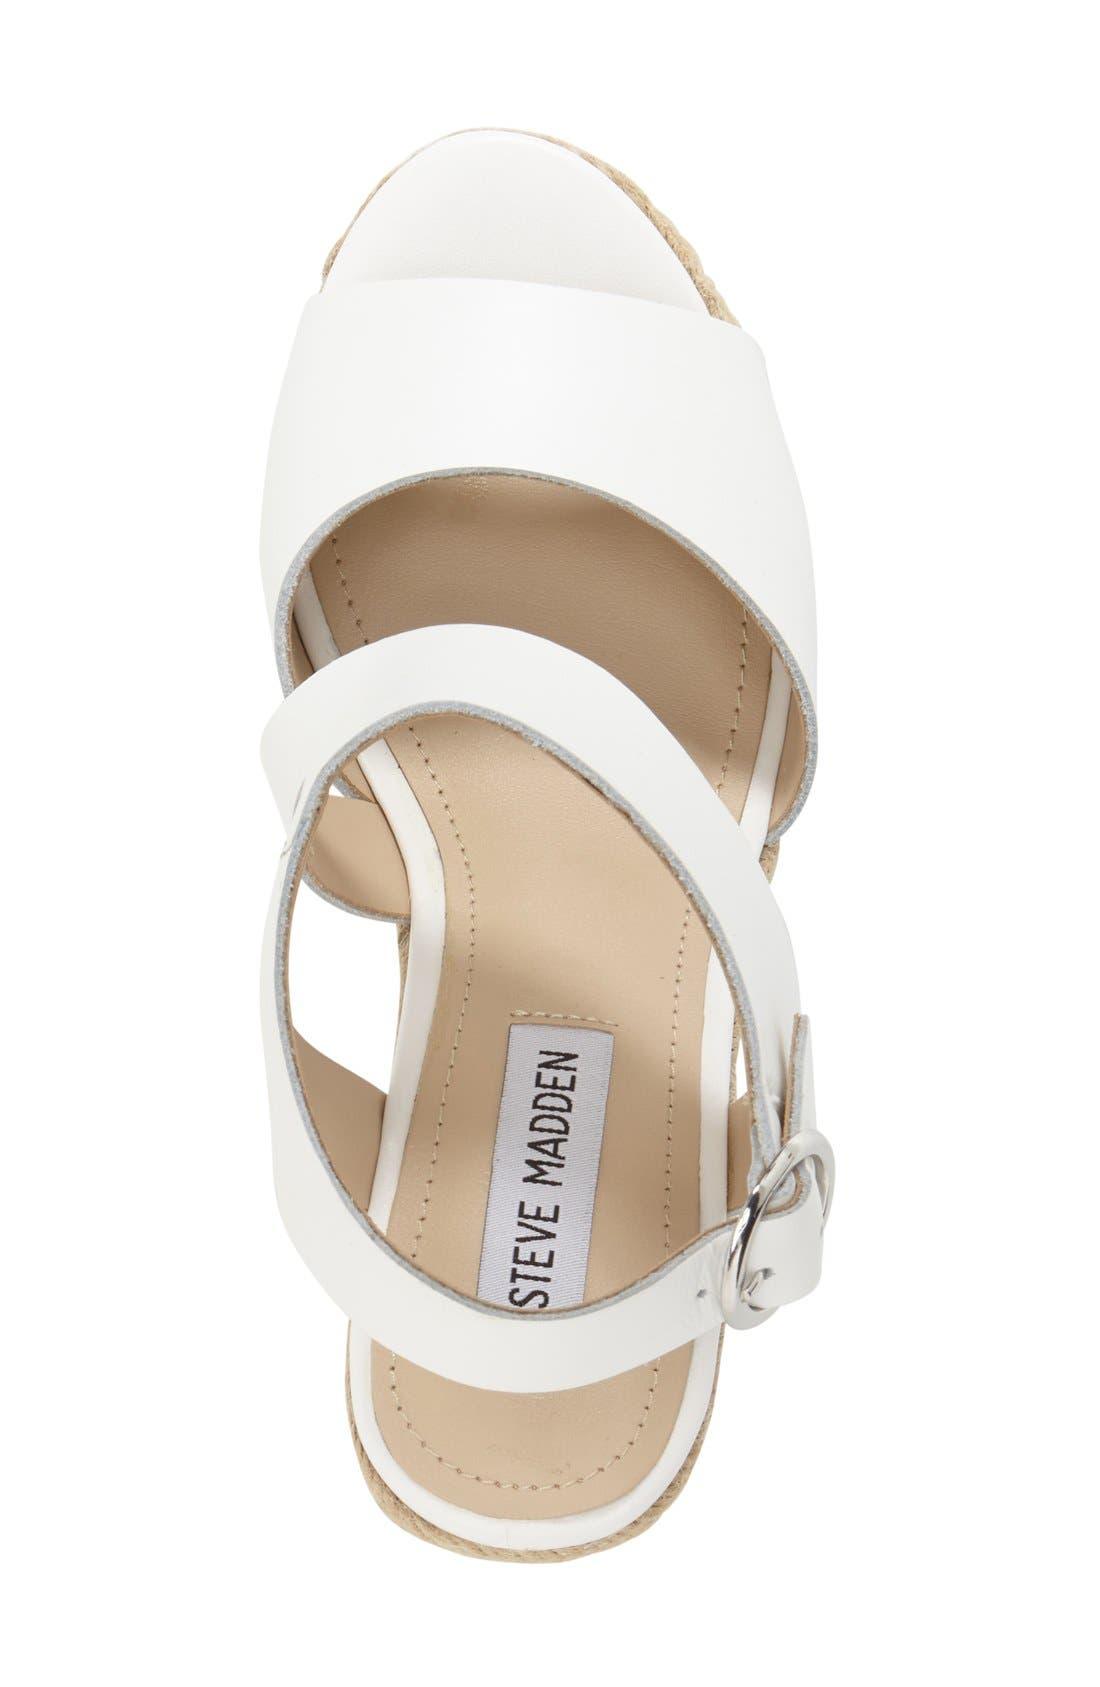 'Wavi' Espadrille Wedge Sandal,                             Alternate thumbnail 3, color,                             White Leather